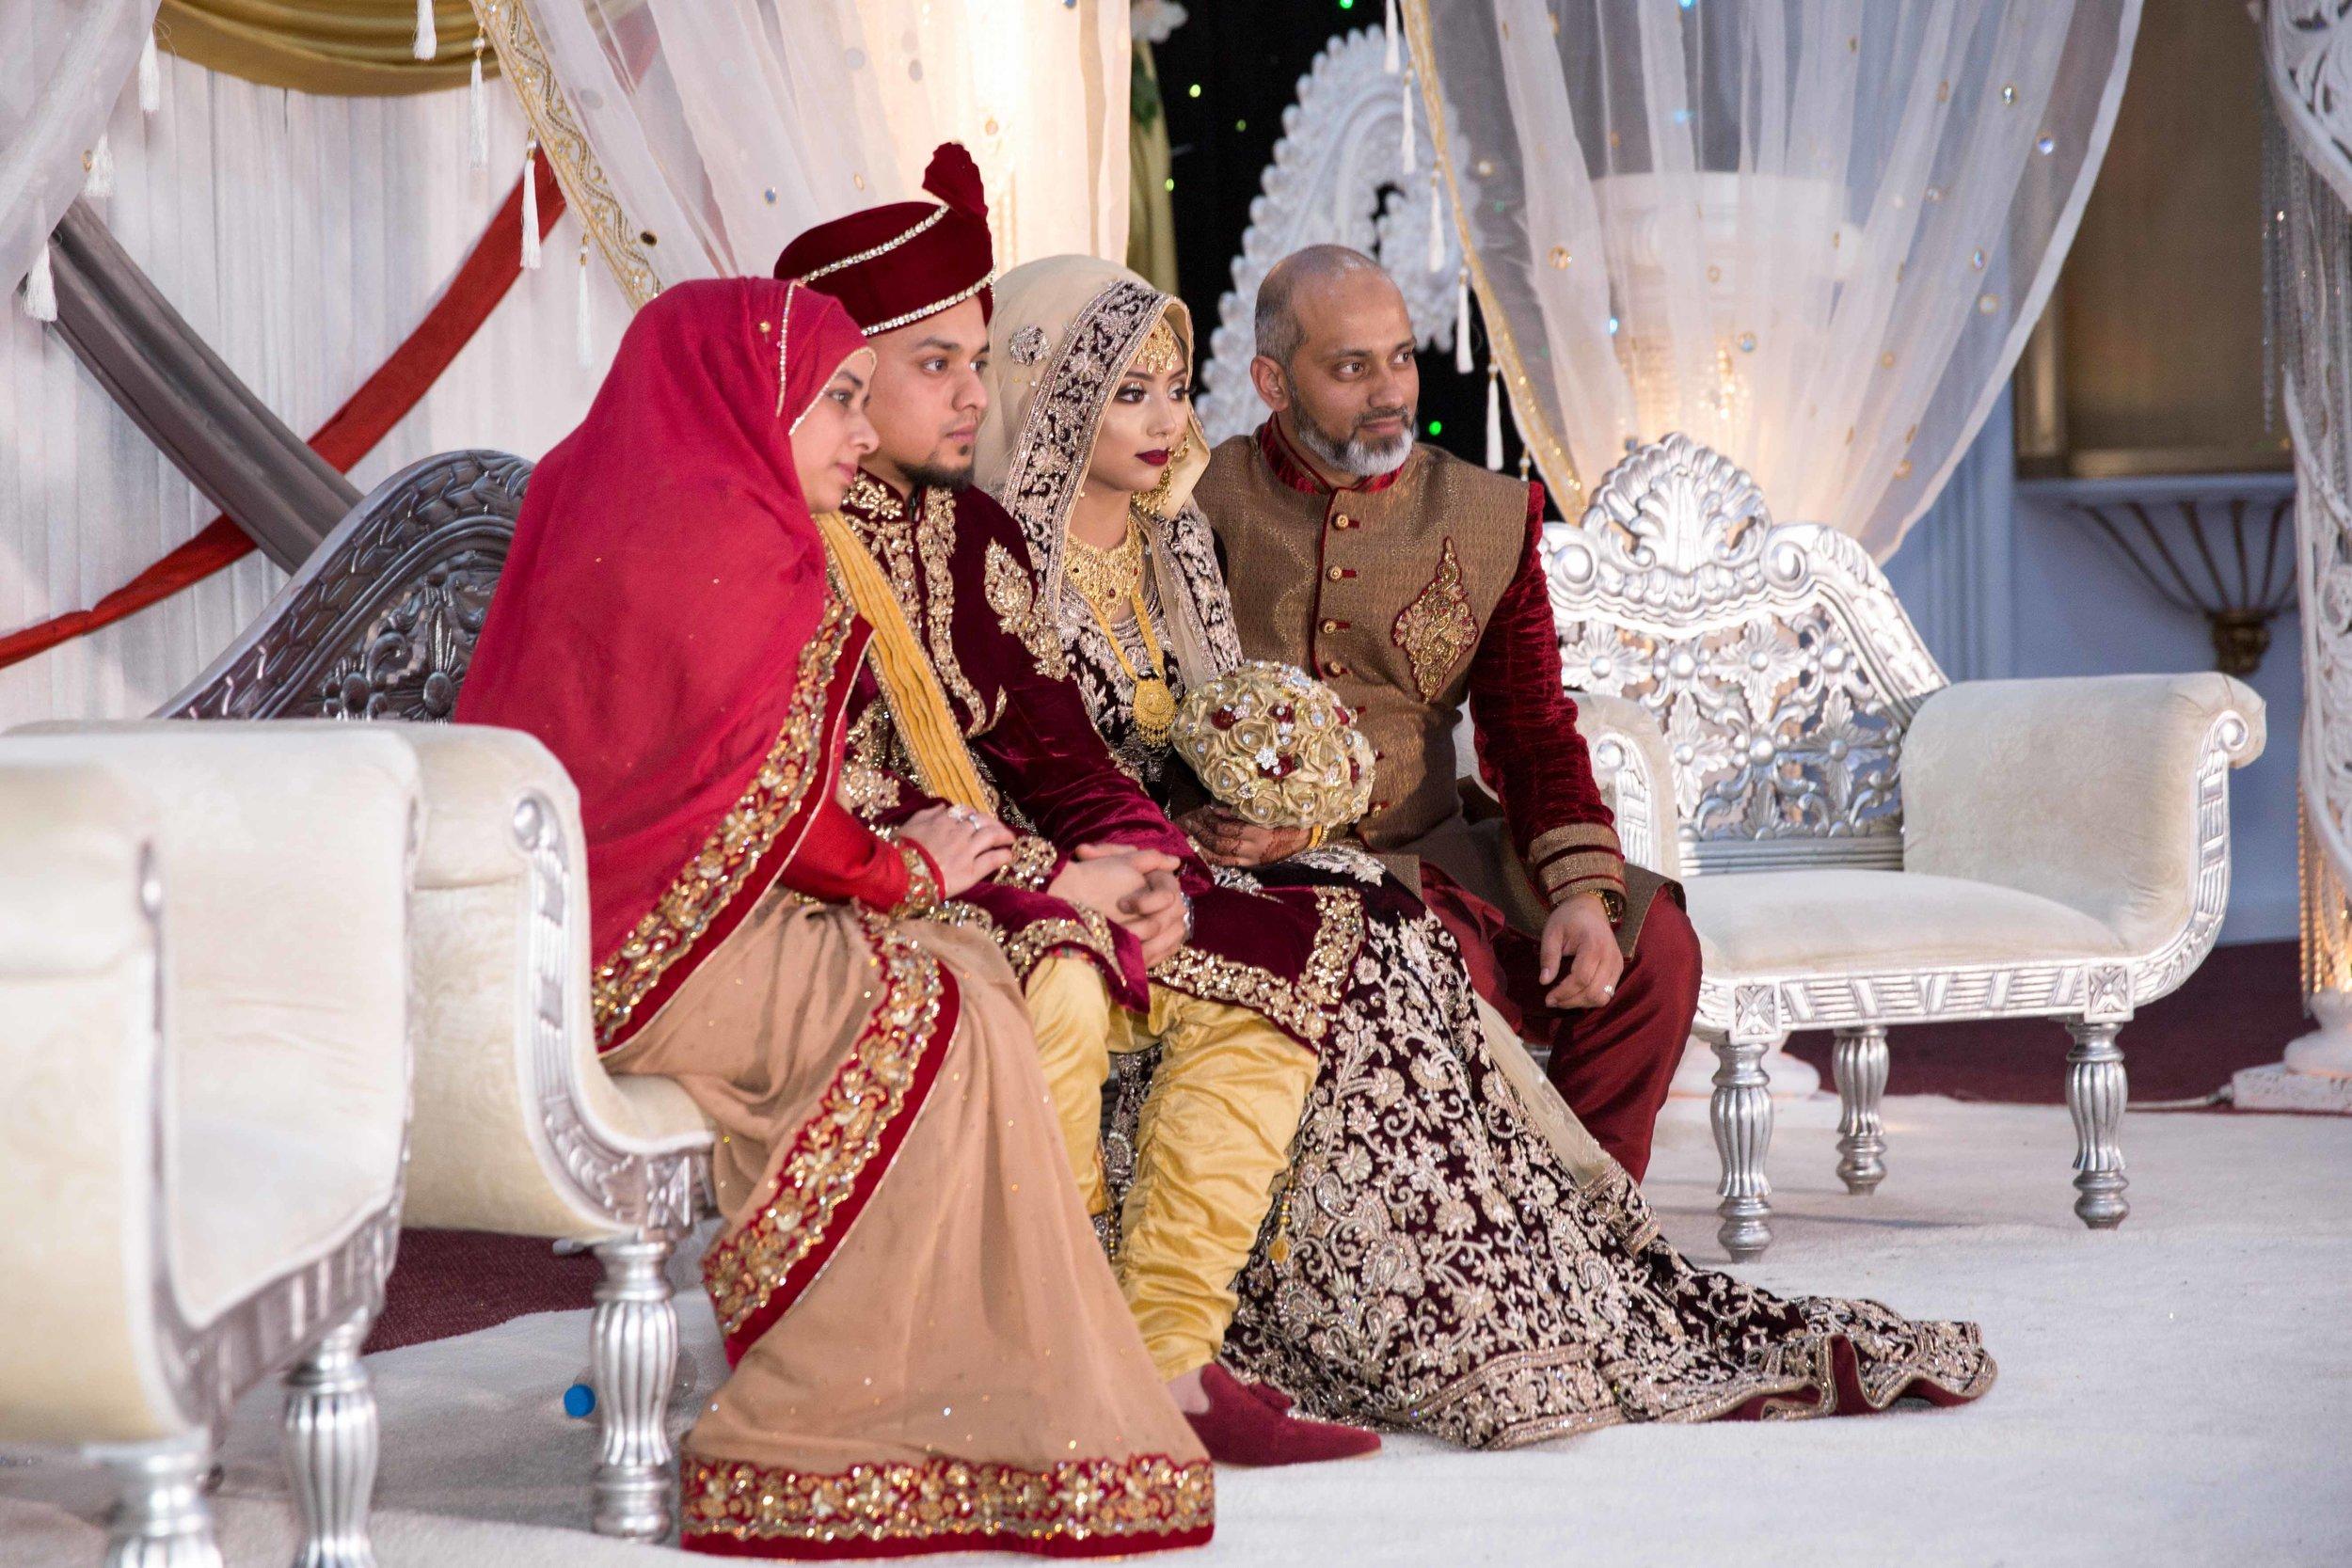 Female-Asian-Piccadilly-banqueting-suite-Wedding-Photographer-Birmingham-natalia-smith-photography-25.jpg